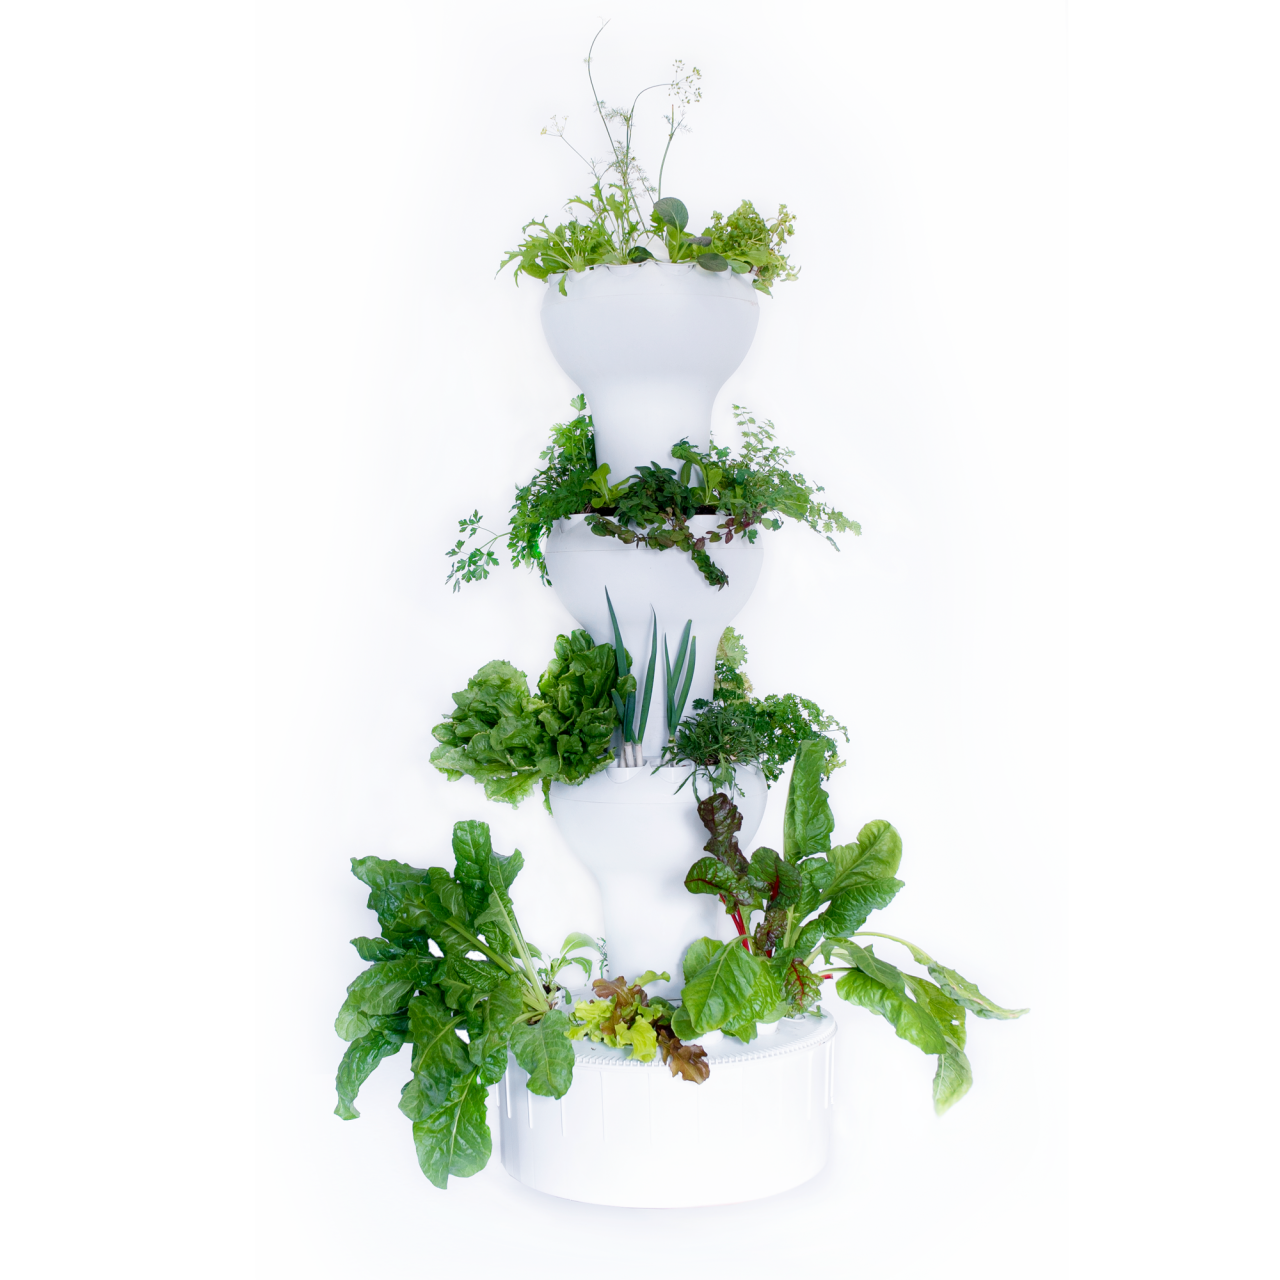 Pflanzsäule 44 Hydroponik bepflanzt